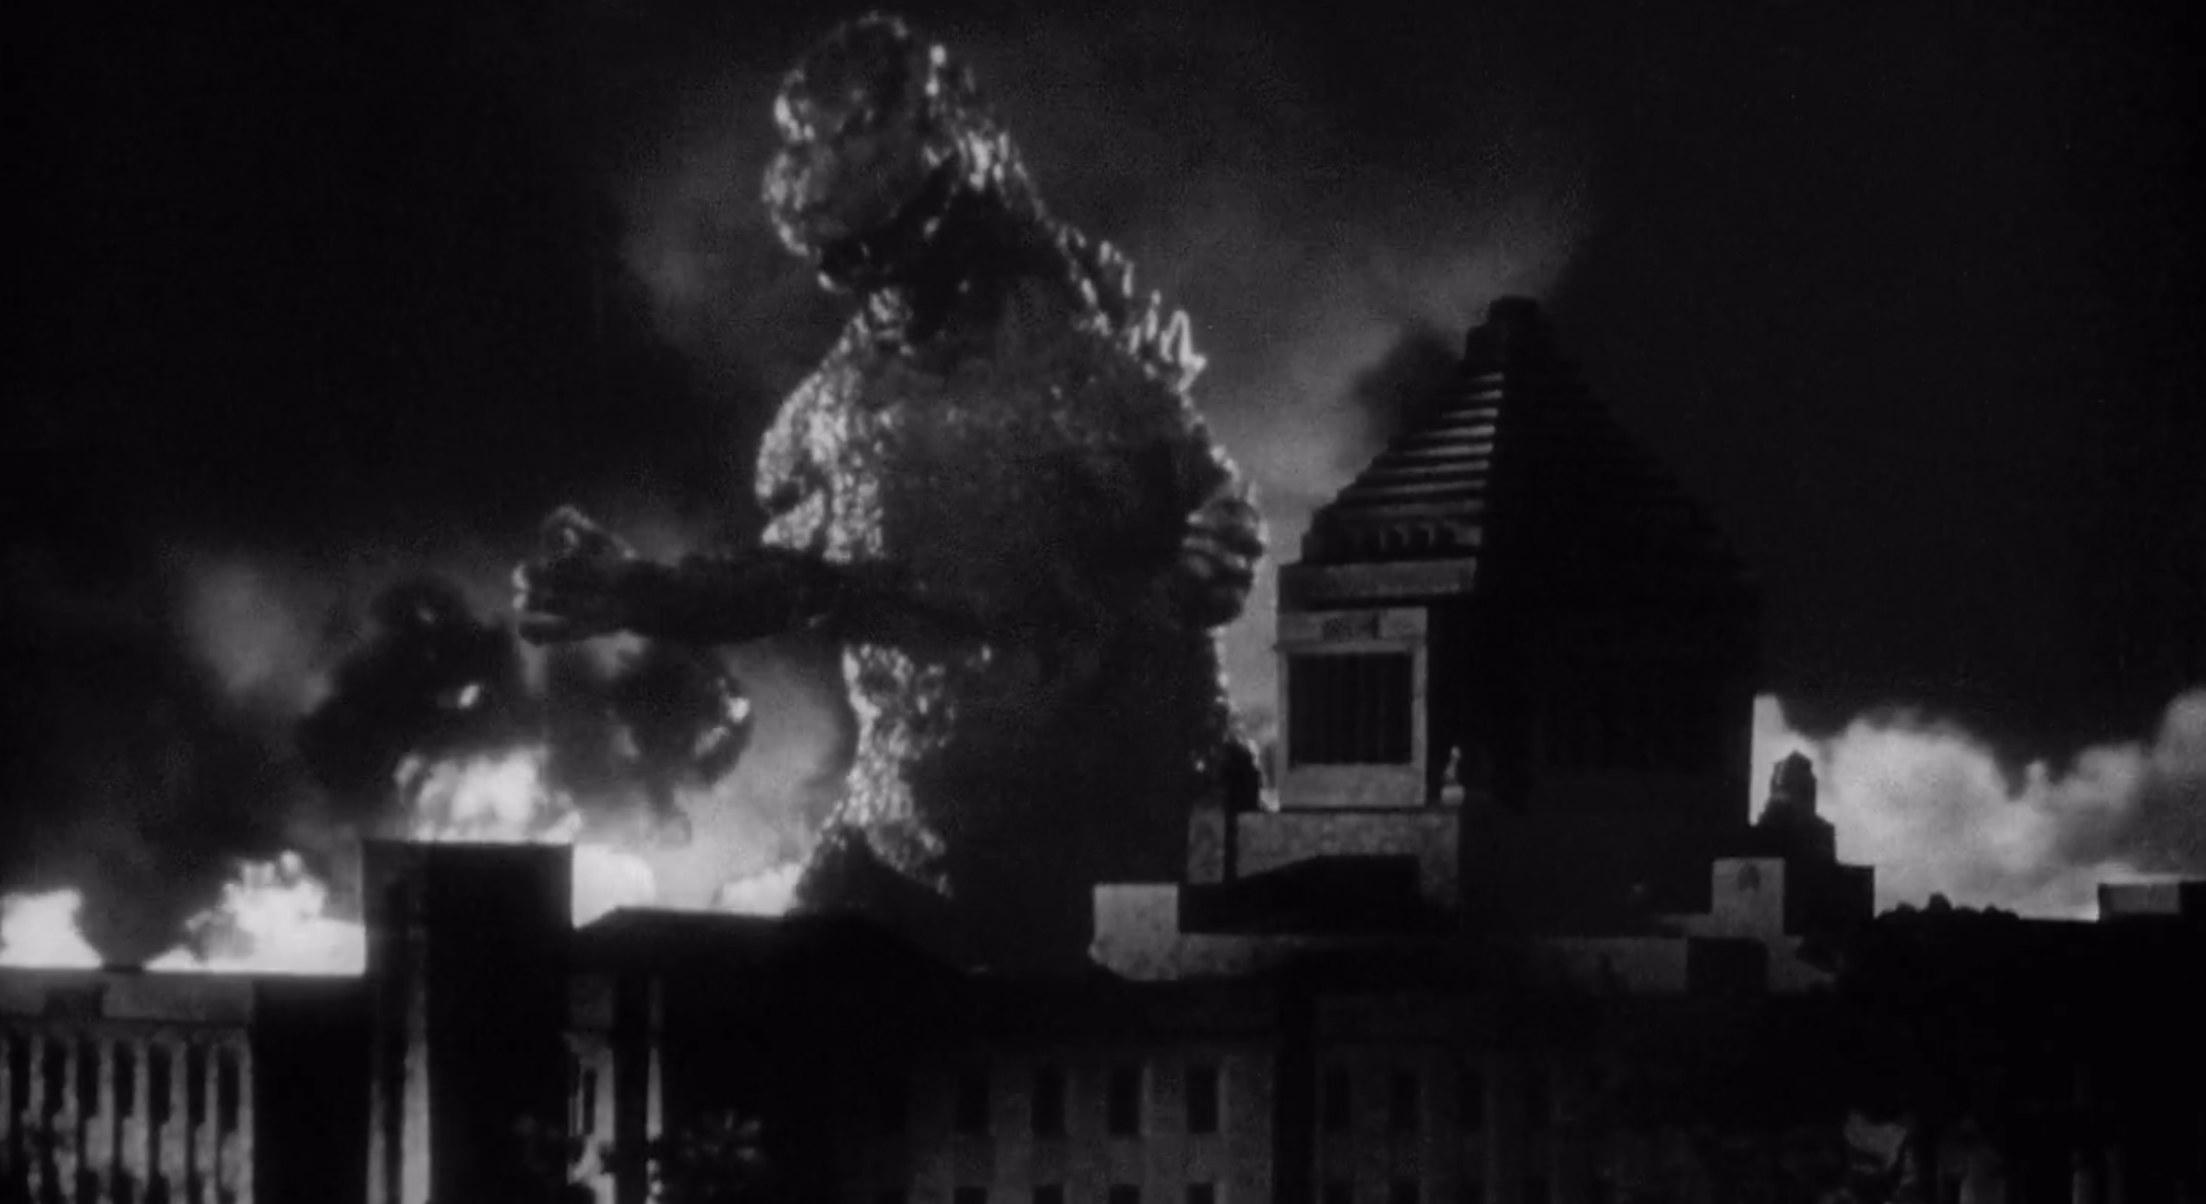 A huge monster terrorizing a city